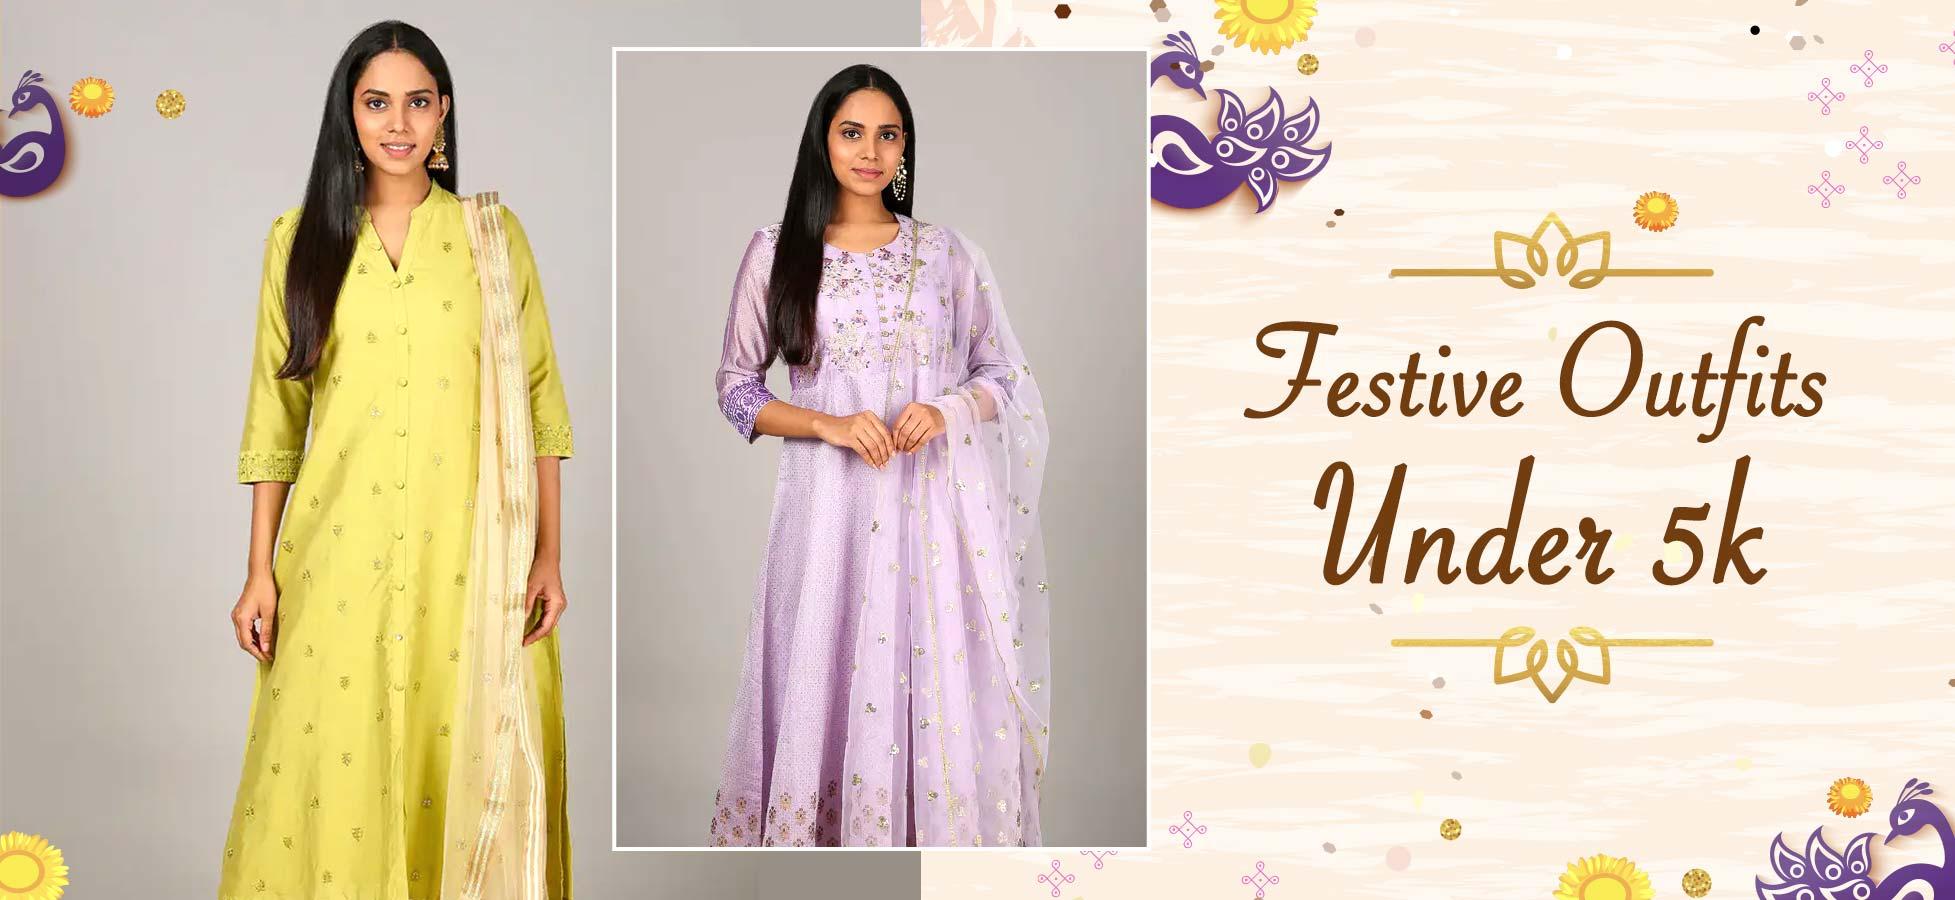 Indian Wear Essentials Under 5k For The Festive Season